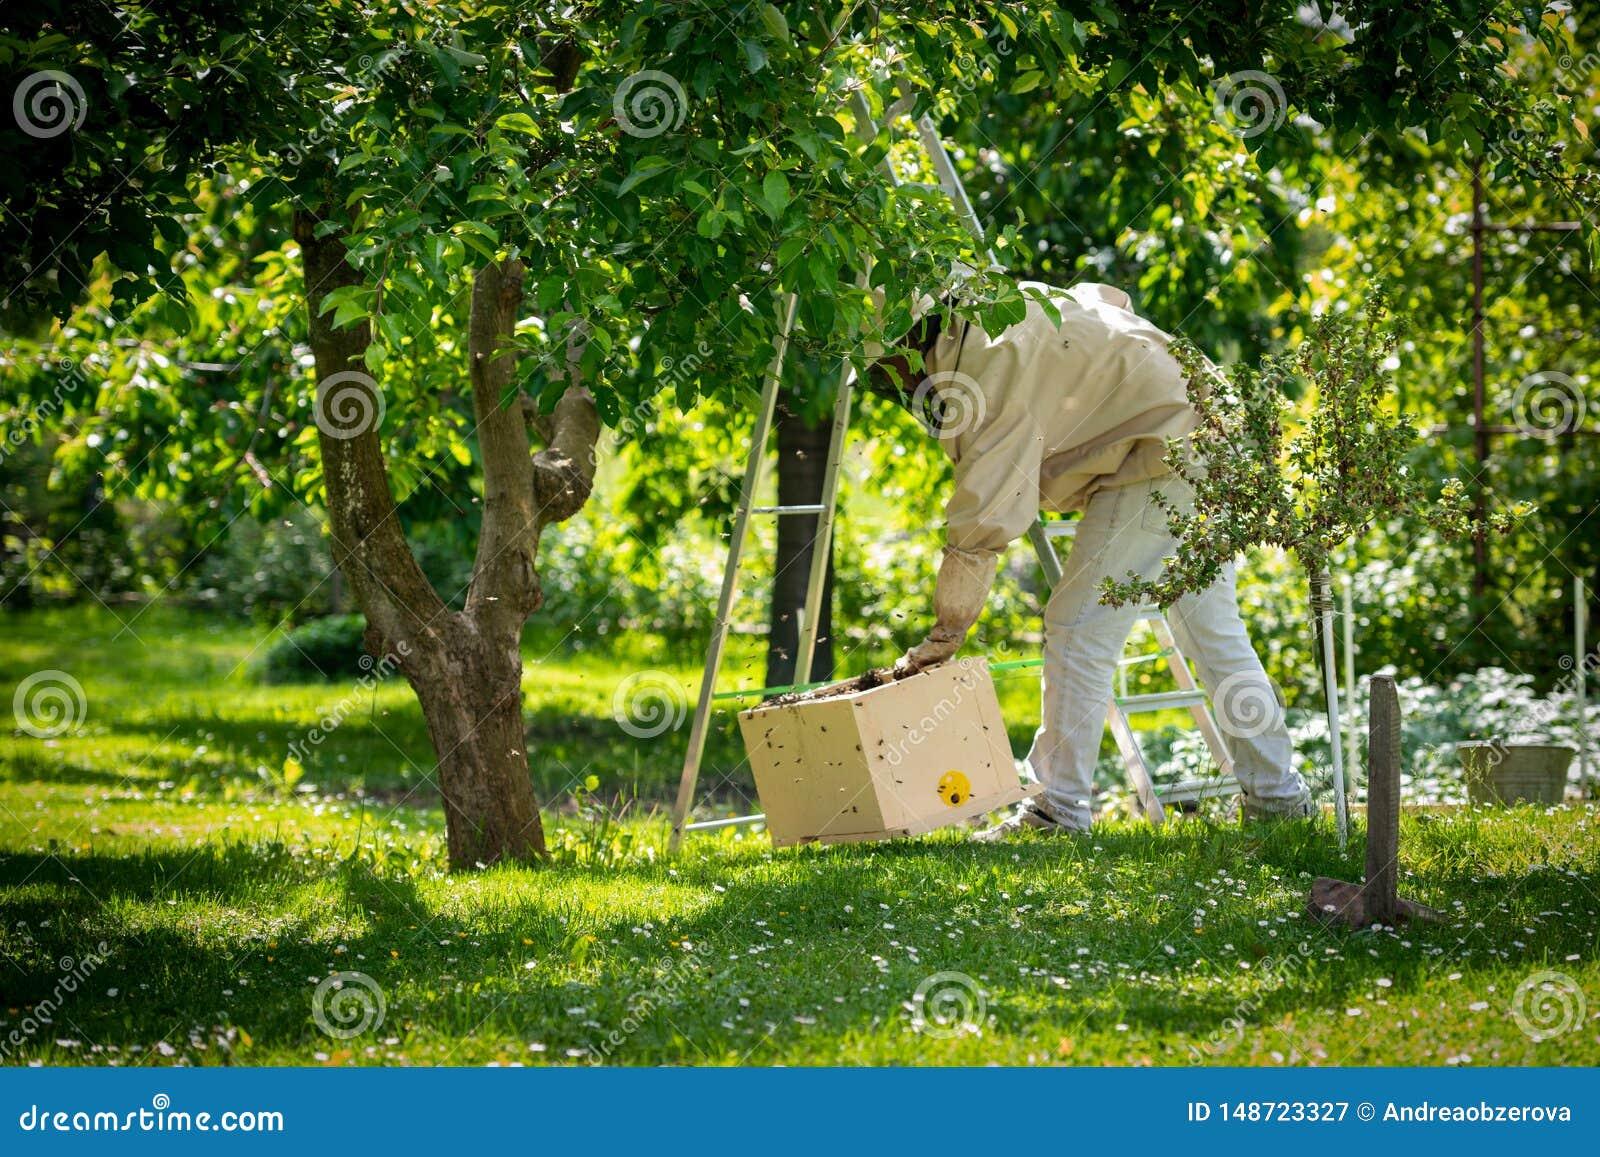 R 收集逃脱的蜂的蜂农从树群集 蜂房背景